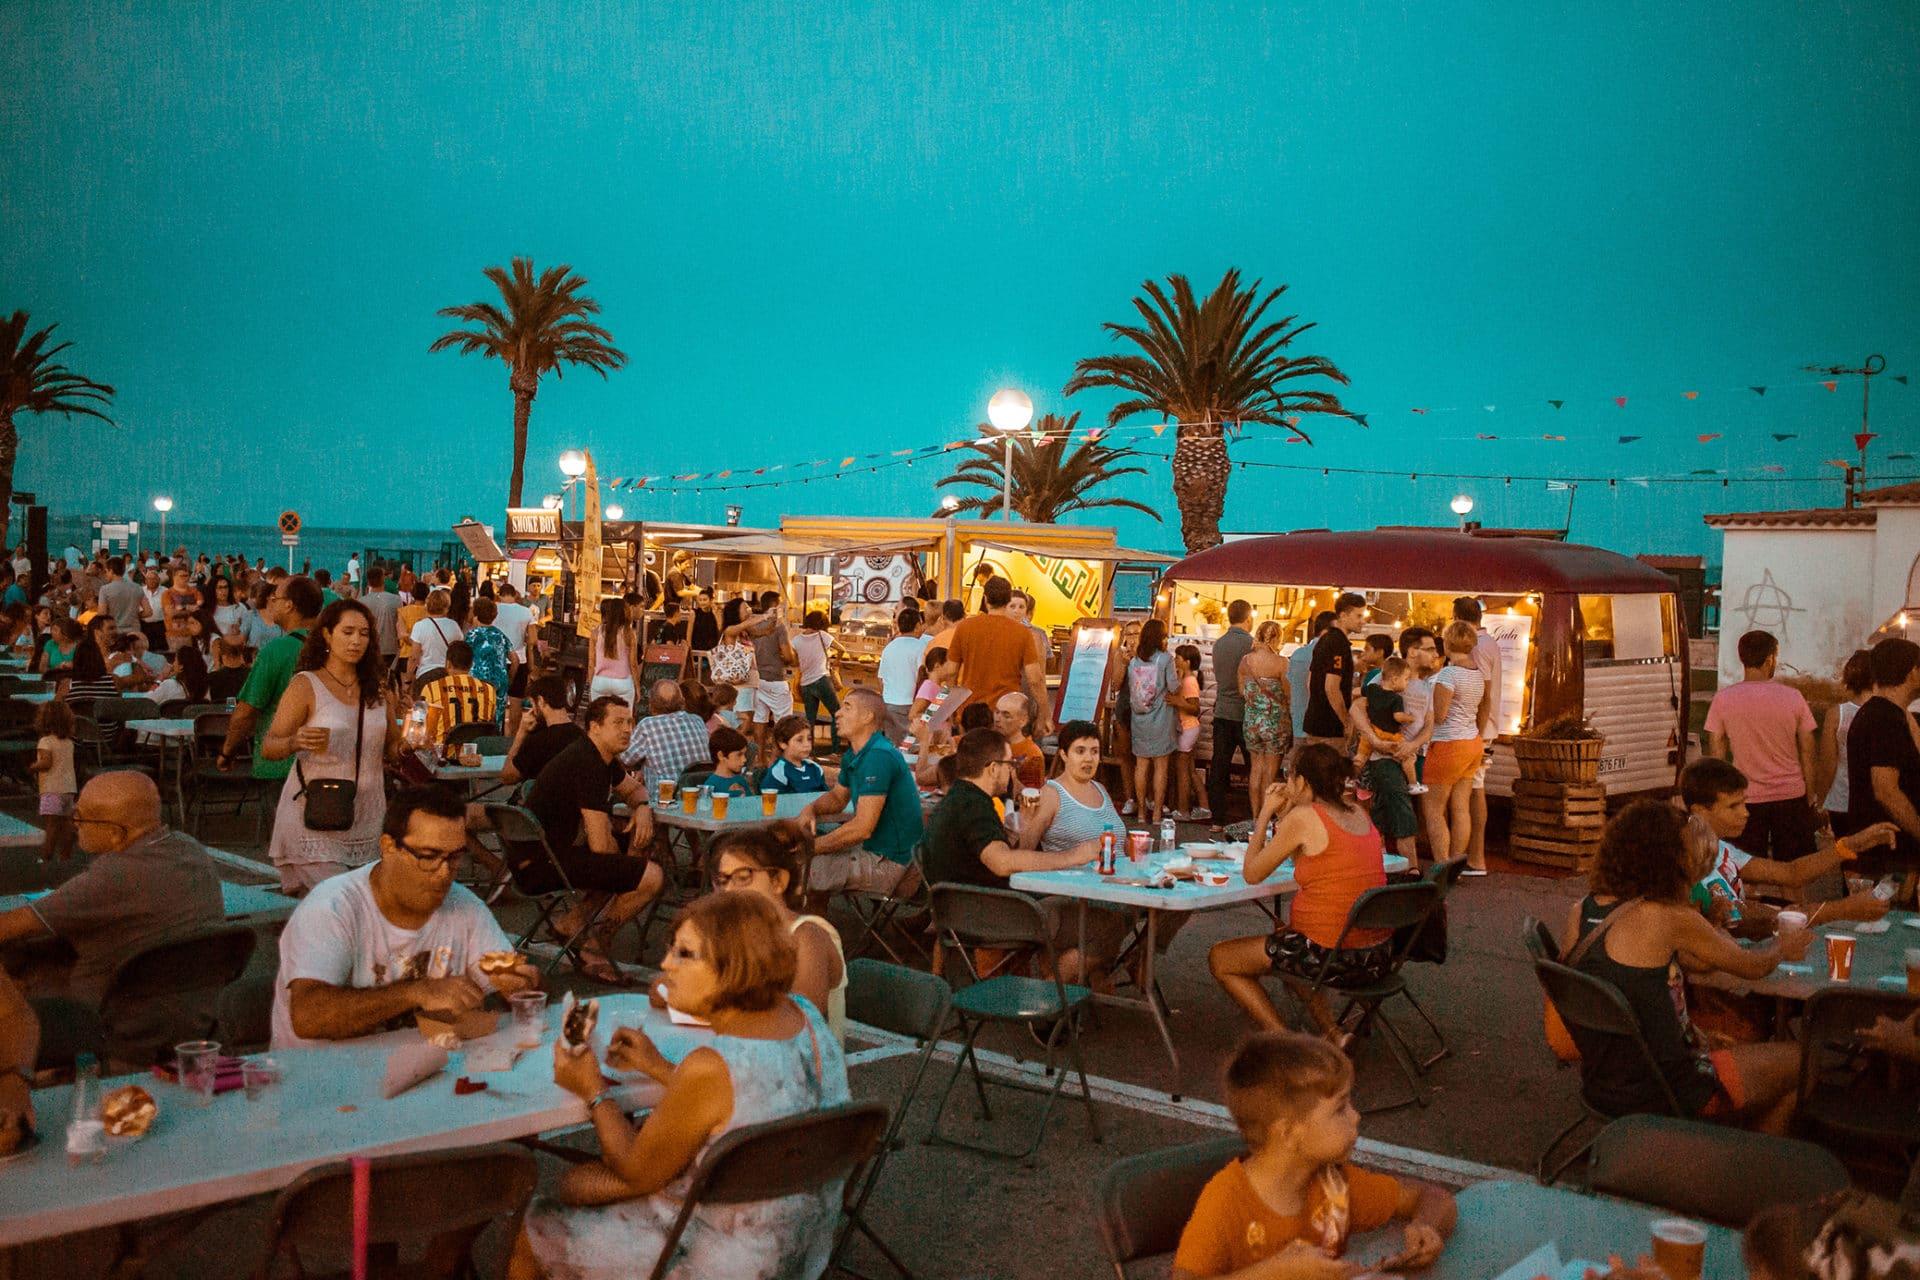 El Festival Nomad Vuelve A Miami Platja Con Una Noche Blanca Ajuntament De Mont Roig Del Camp